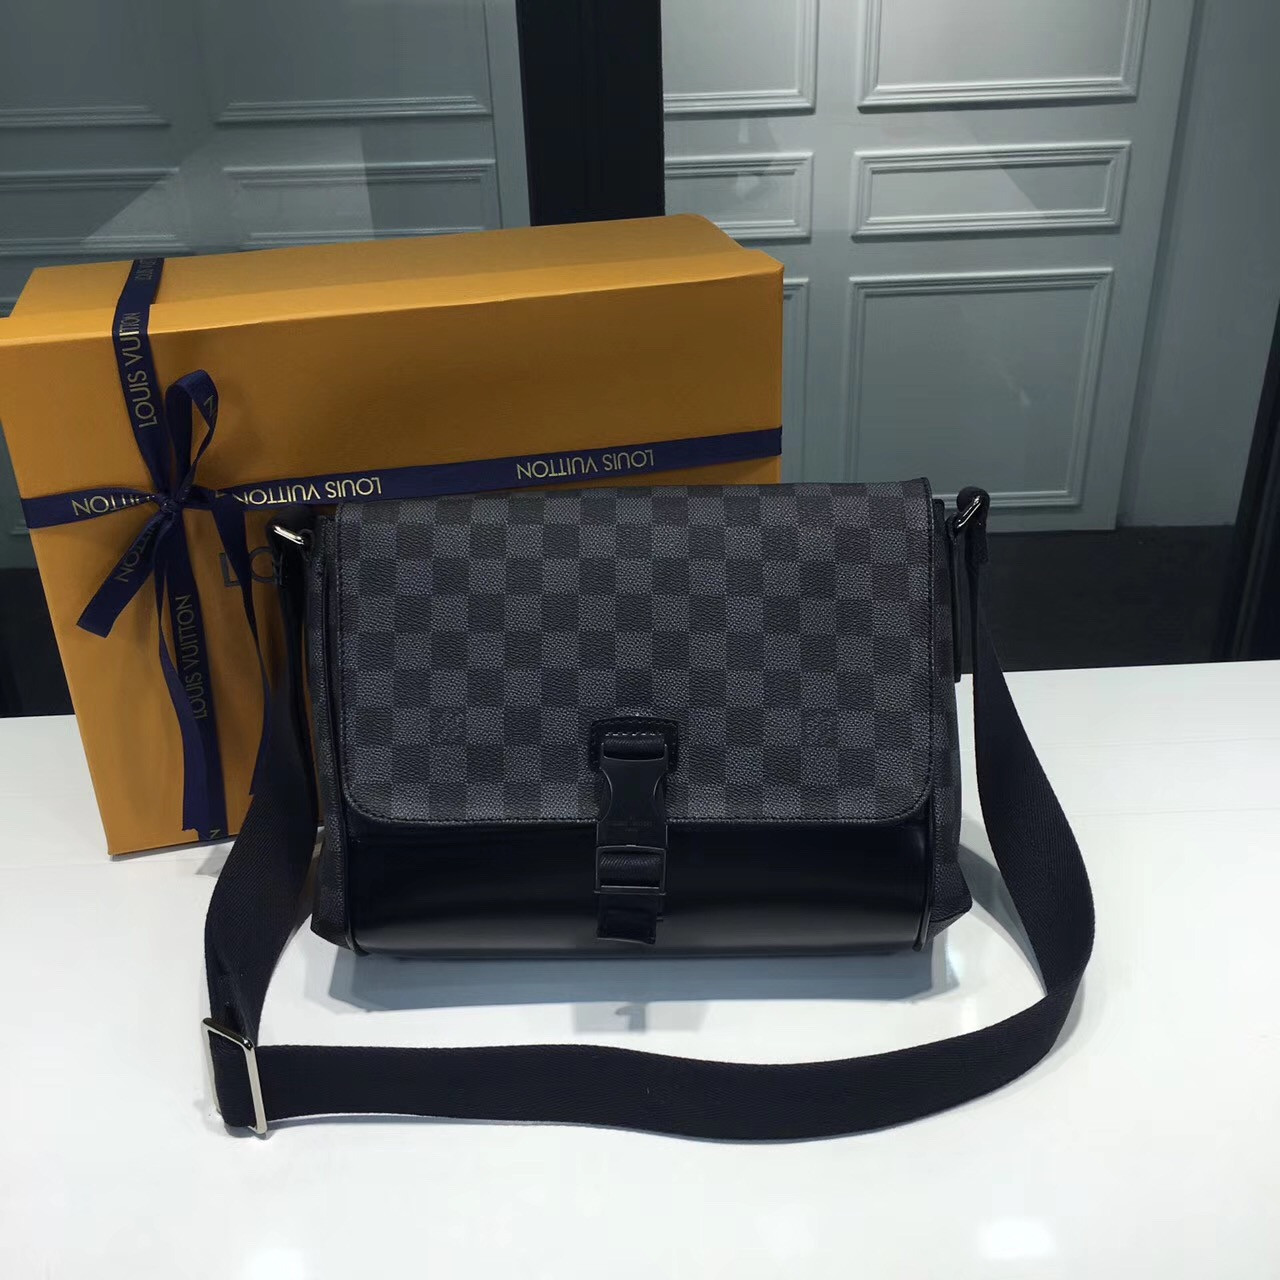 7ca6f90dca91 Louis Vuitton - мужская сумка Messenger MM, цена 7 300 грн., купить ...